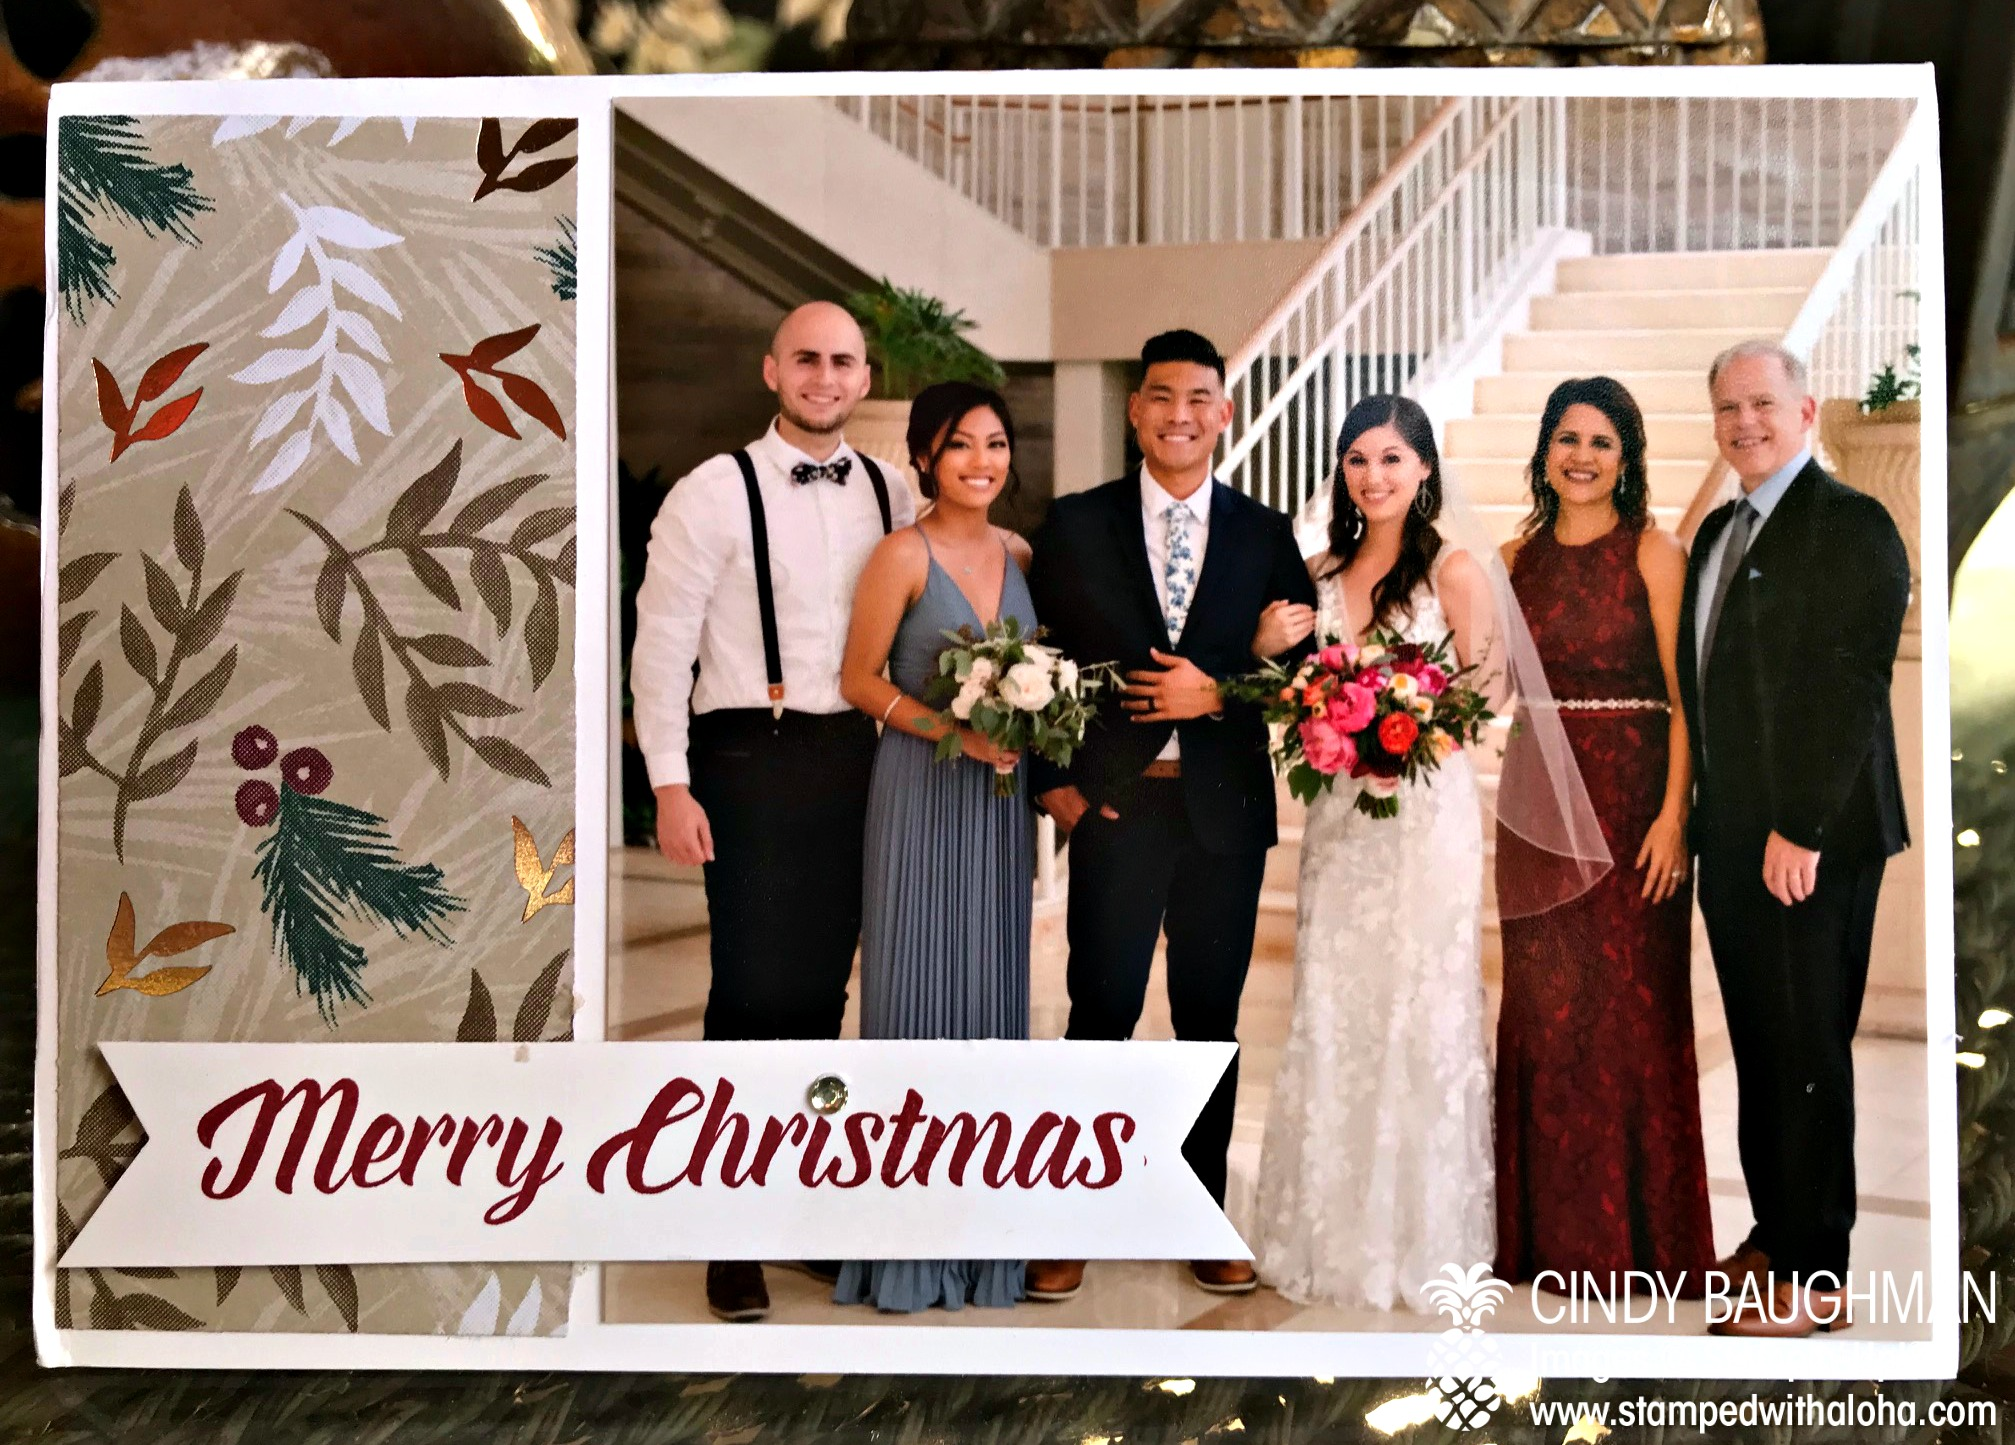 2018 Baughman Family Christmas Card